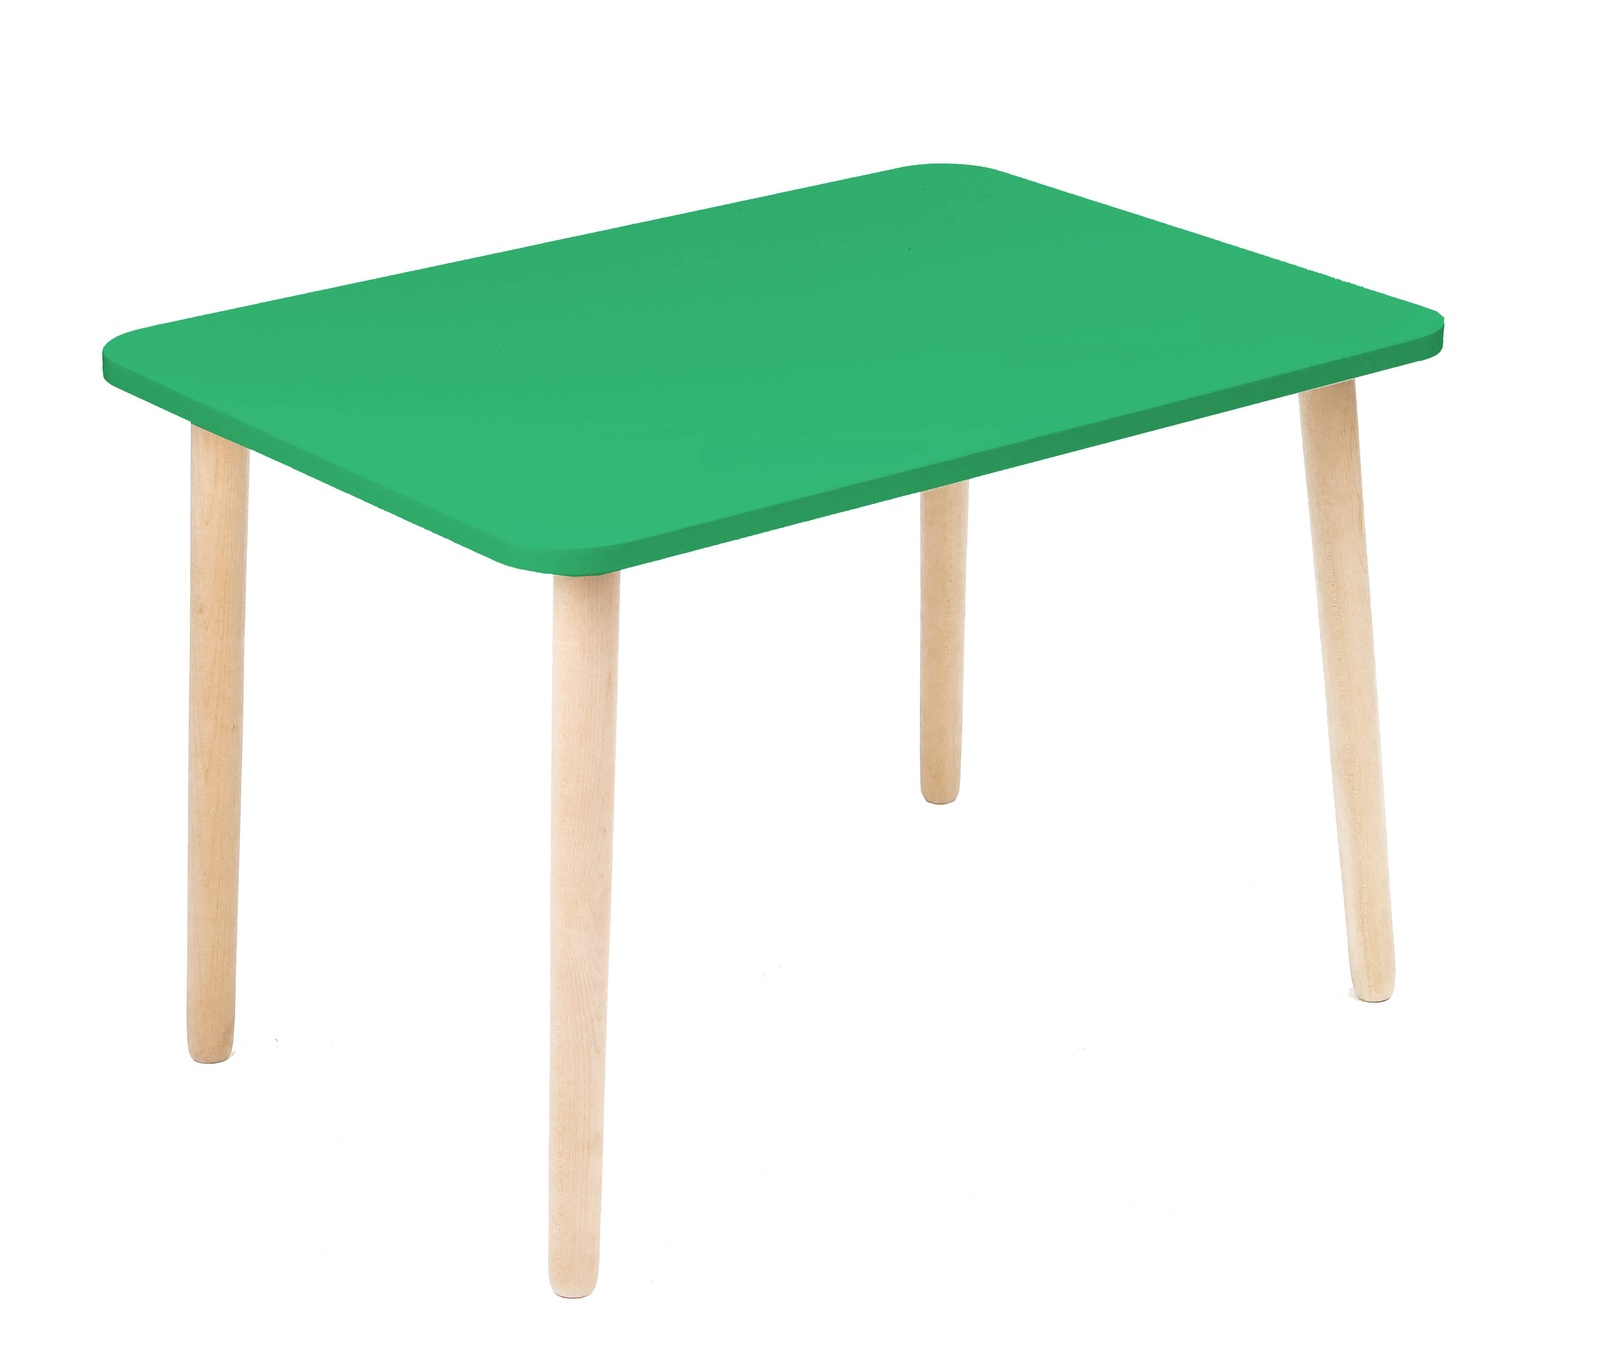 Детский стол Polli Tolli Джери, зеленый стол polli tolli джери оранжевое солнце